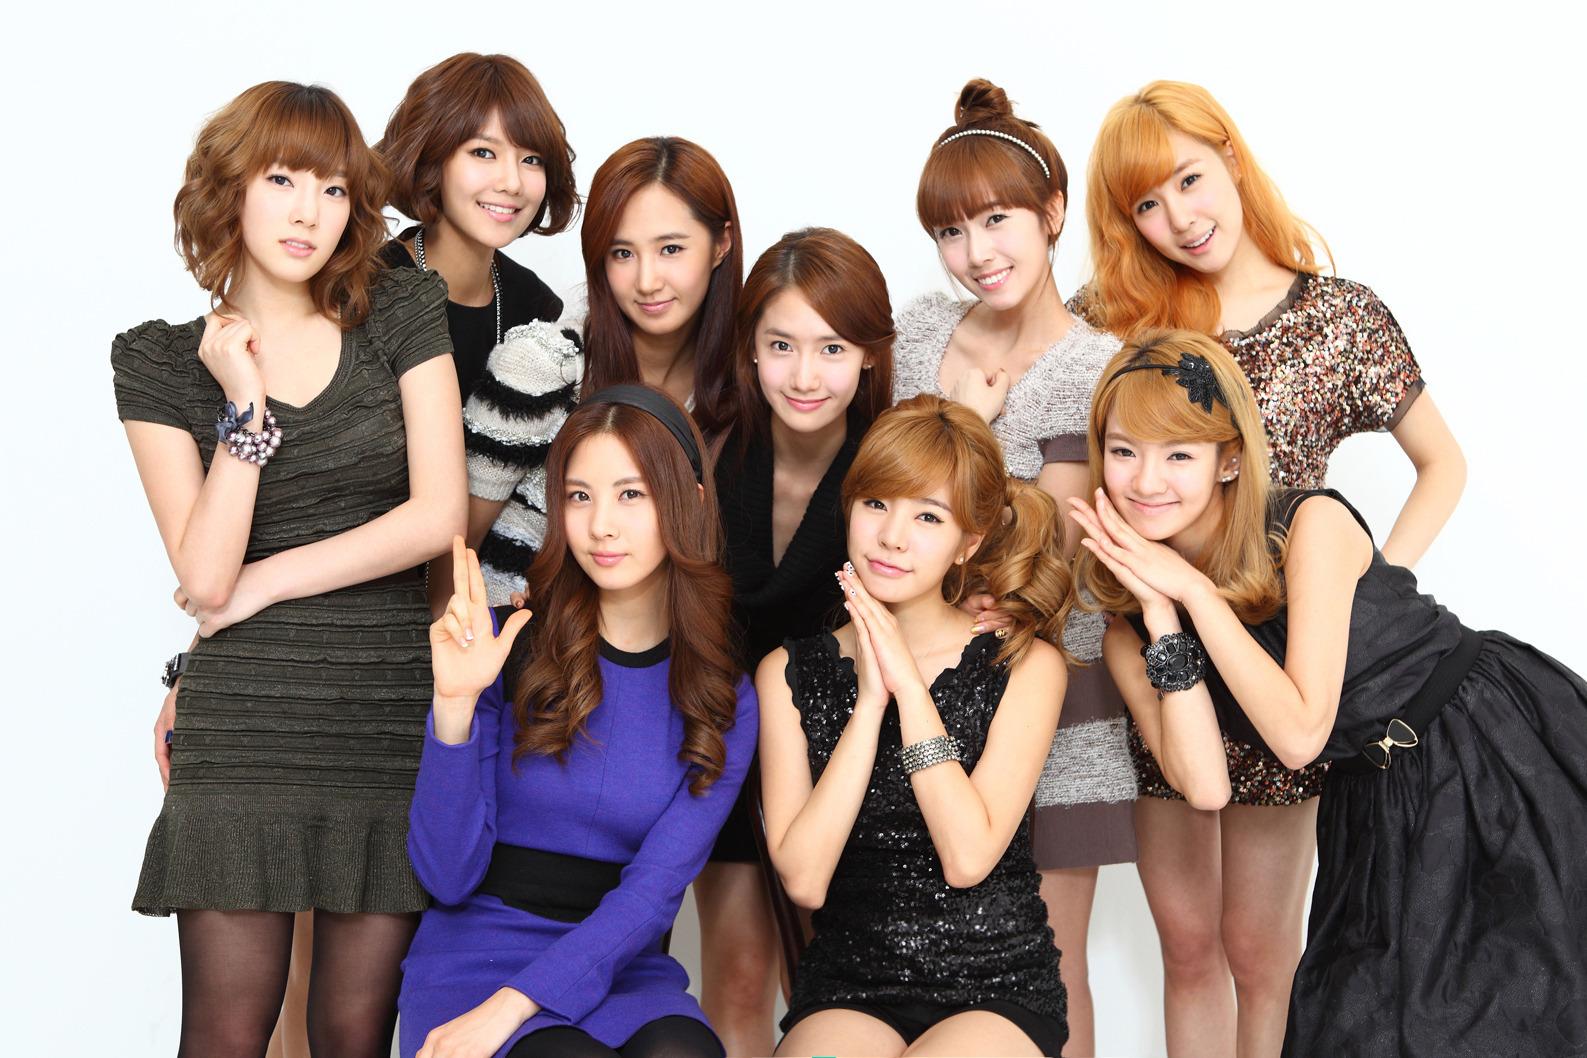 top kpop music: The Best of the k-pop :Girls Generation